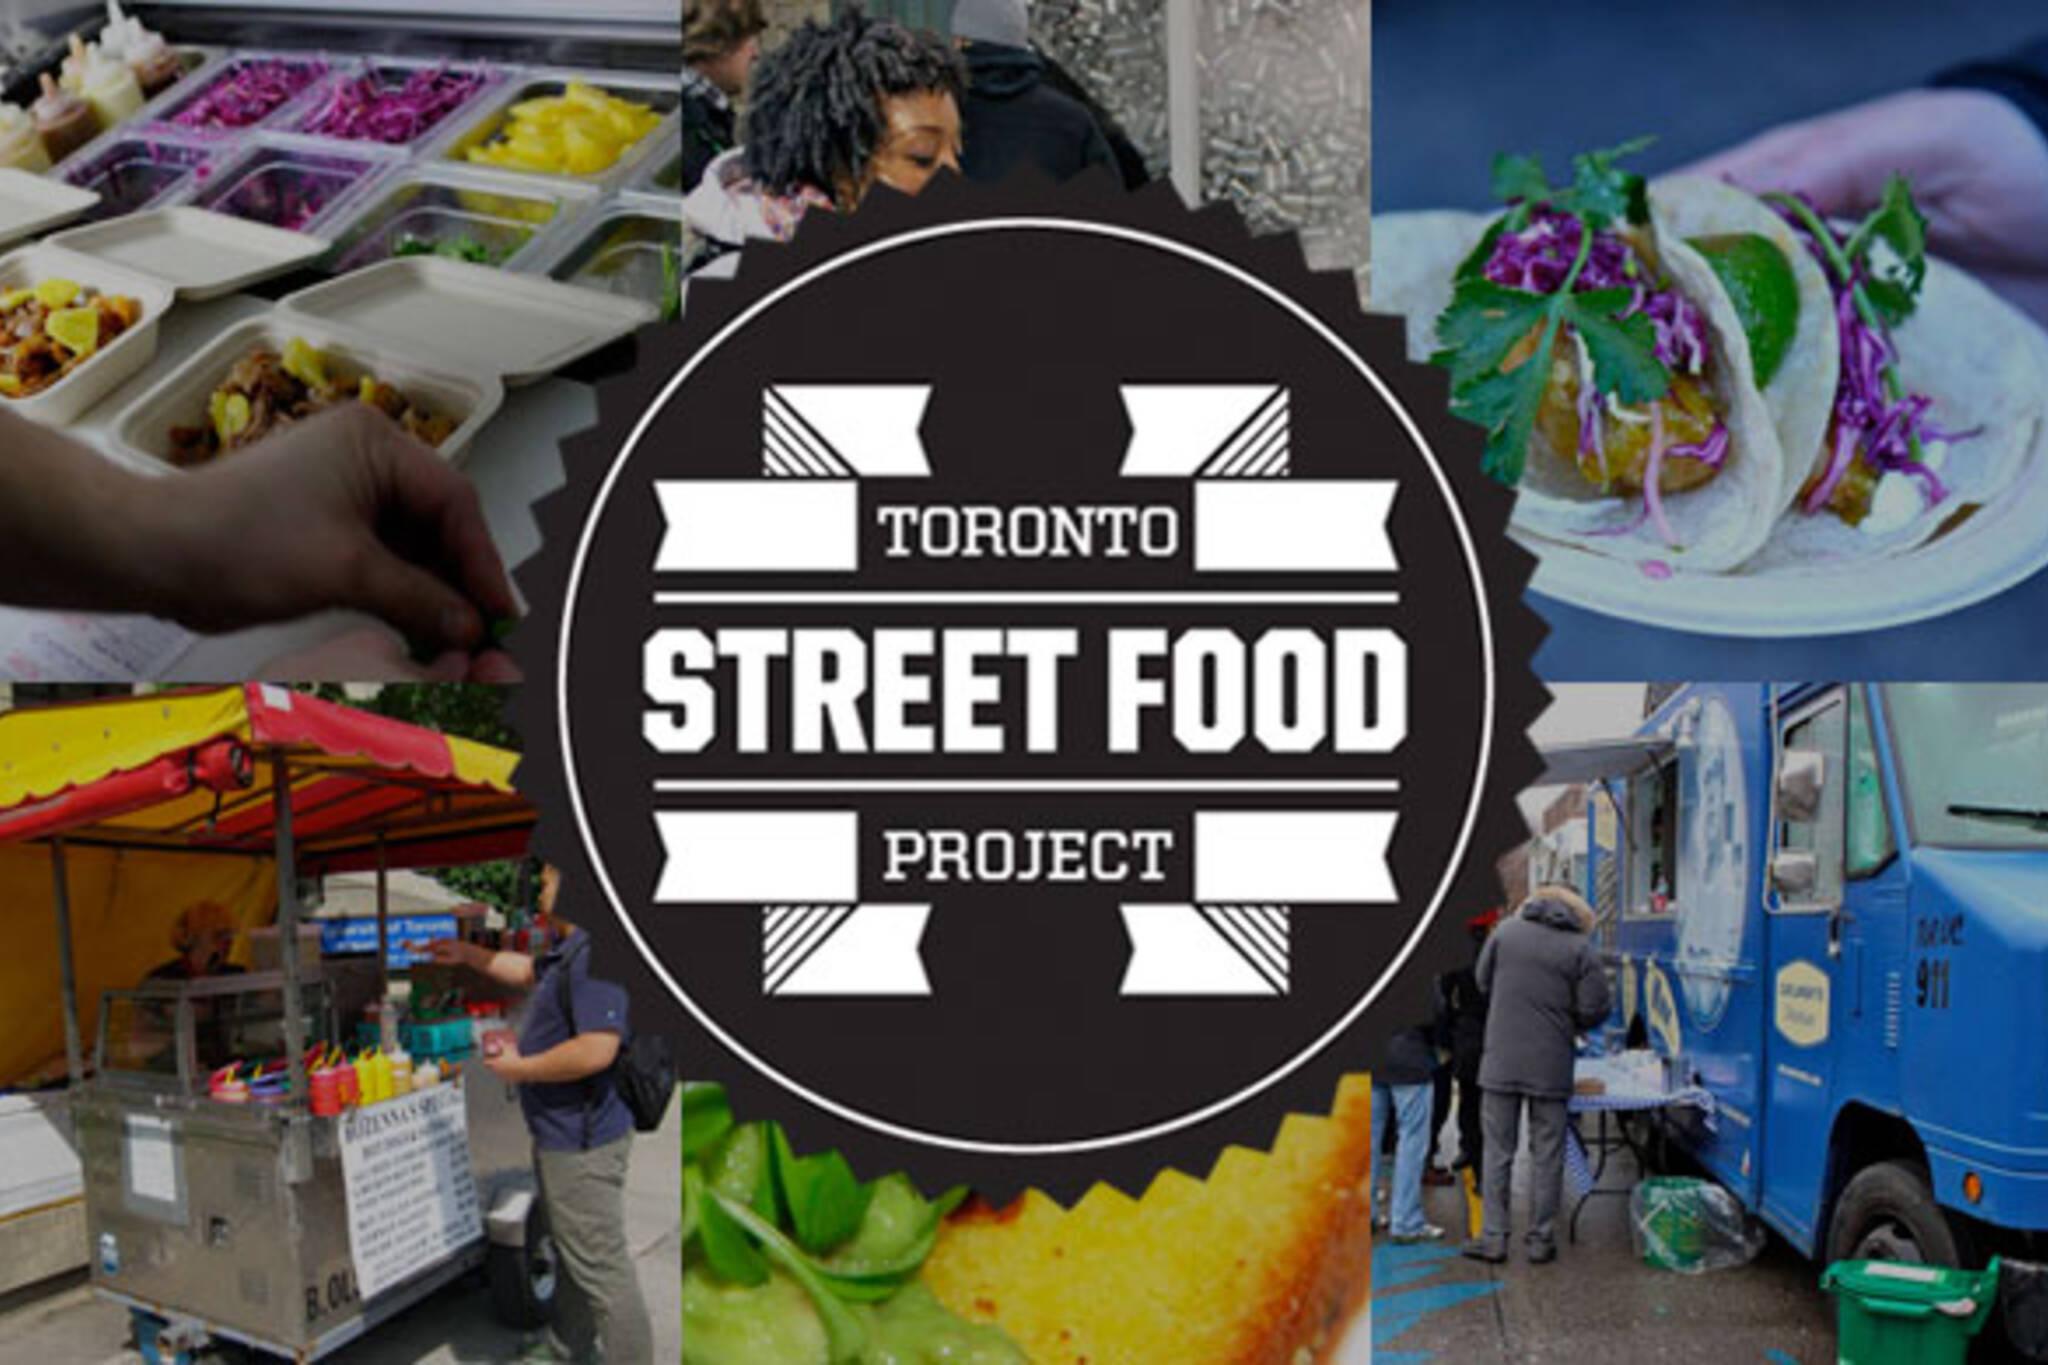 Toronto Street Food Project